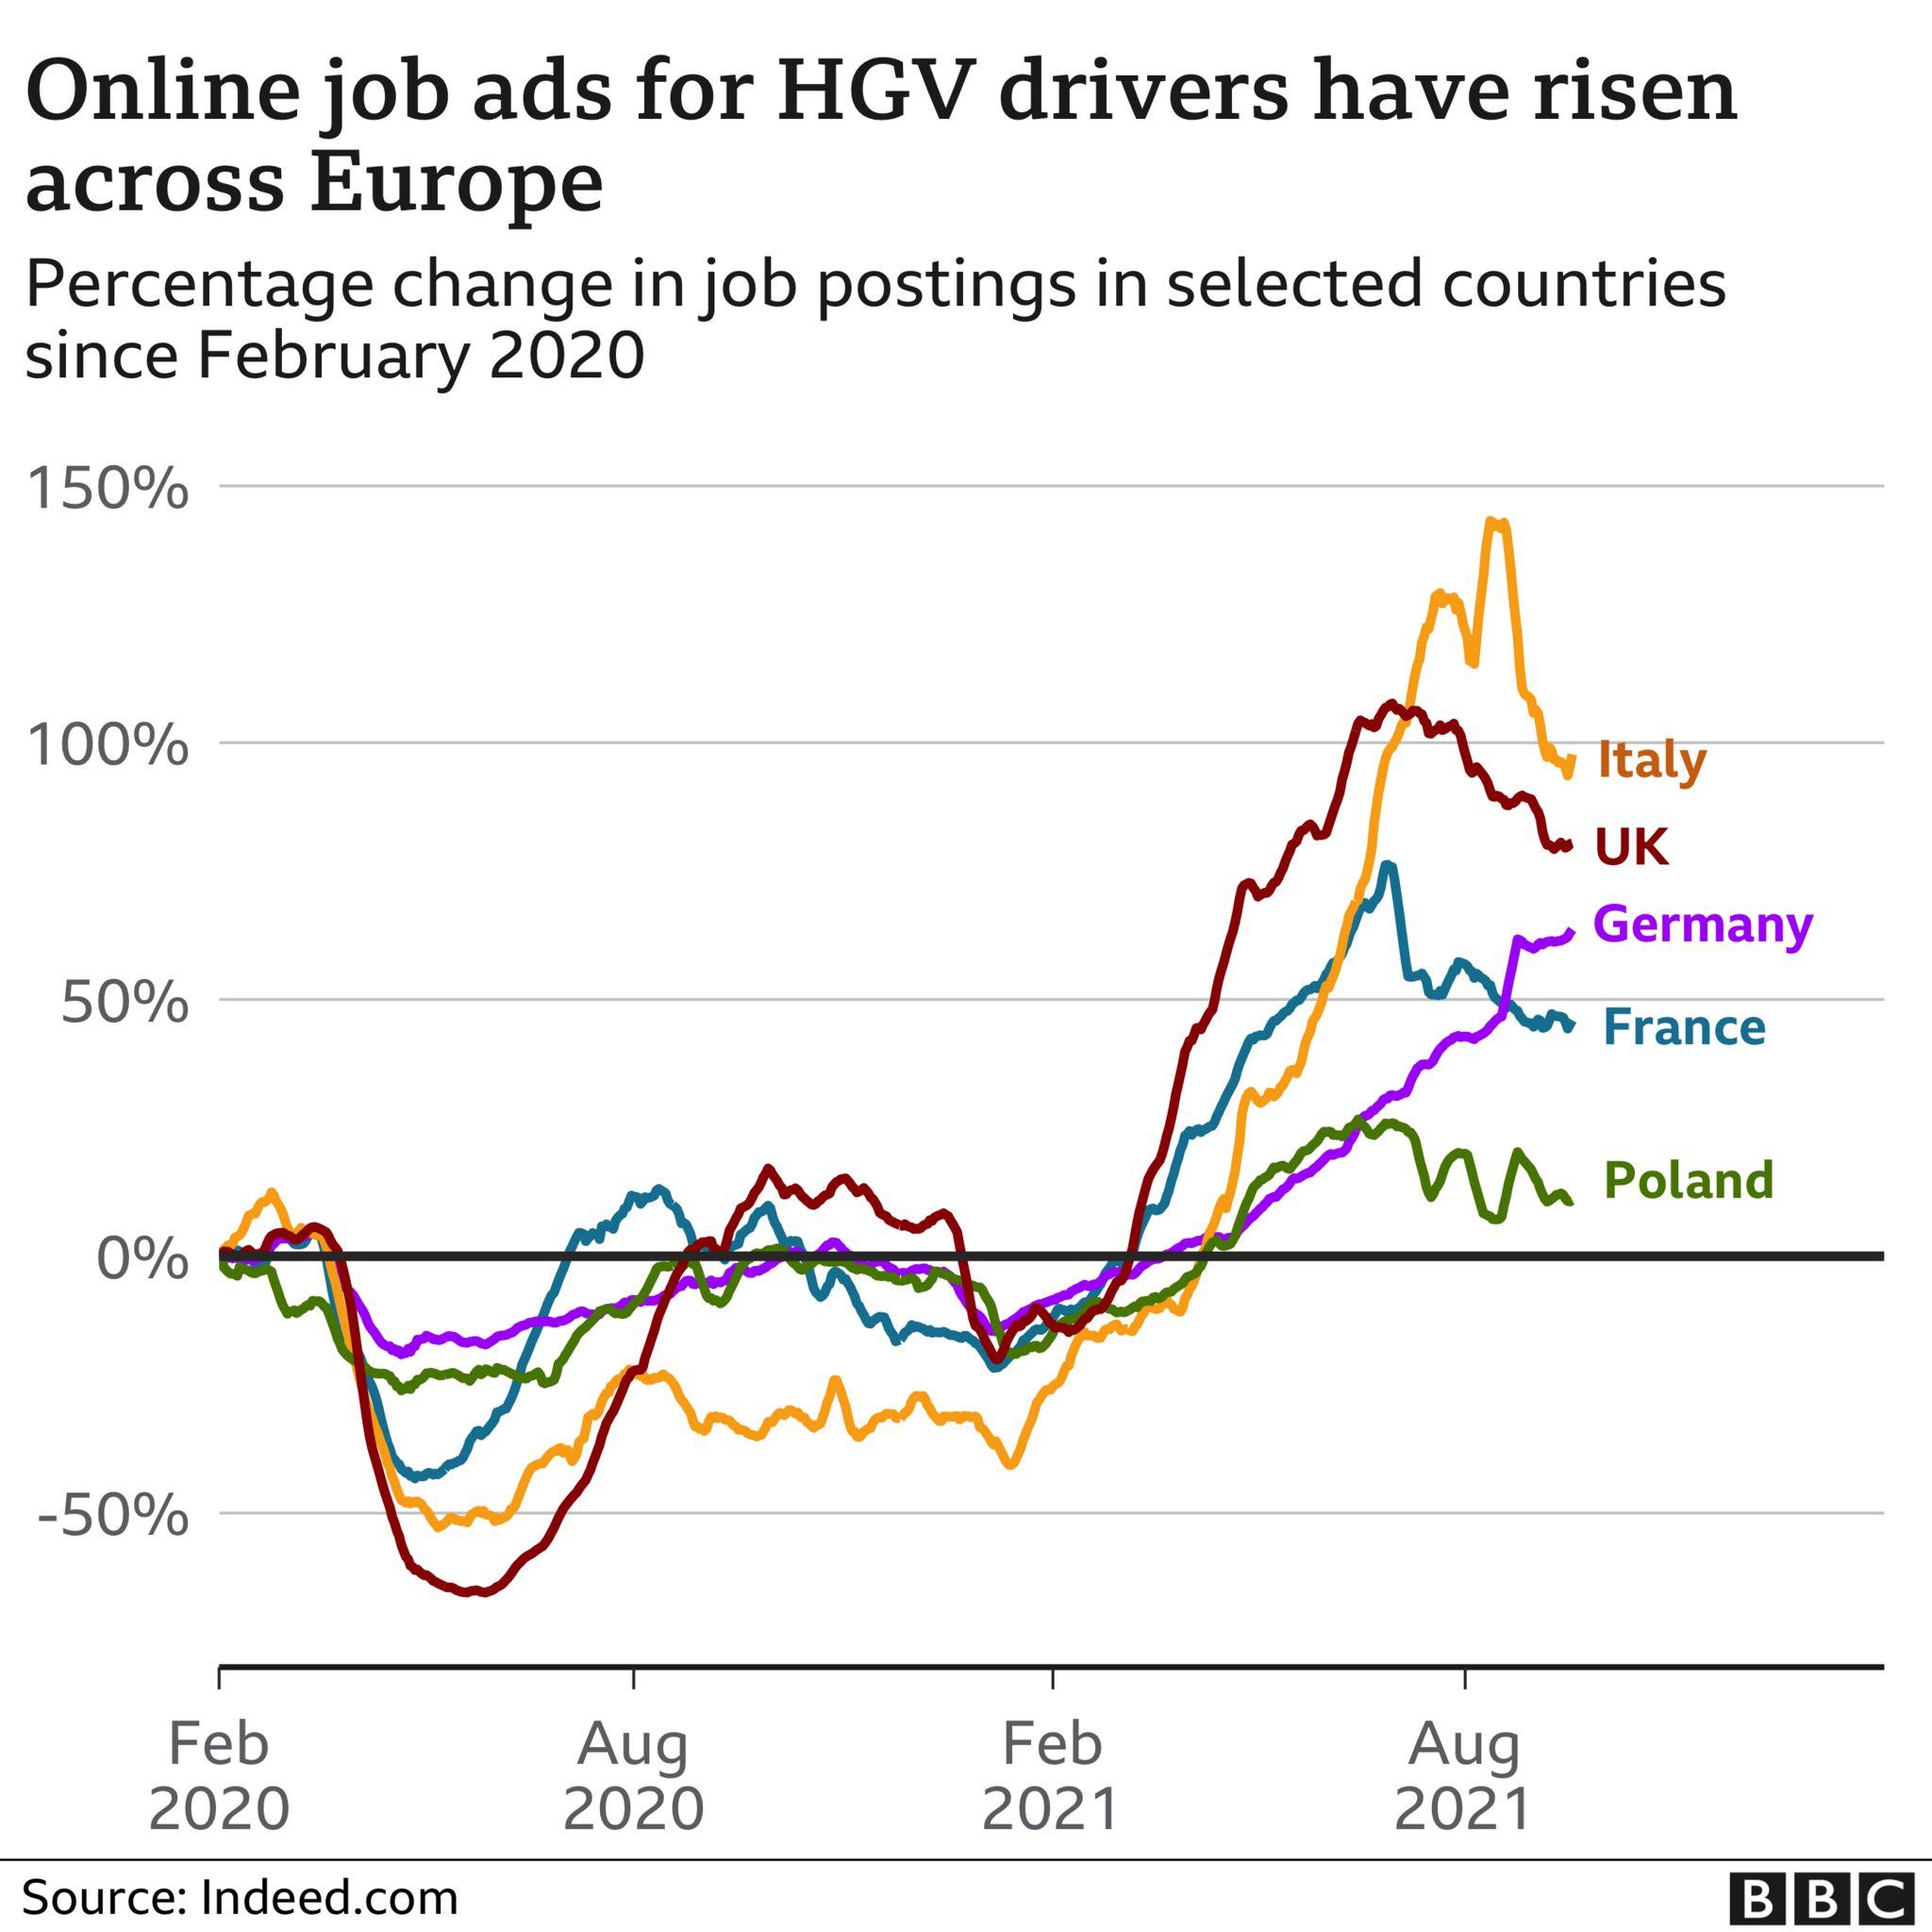 Chart showing HGV job ads rising across European countries